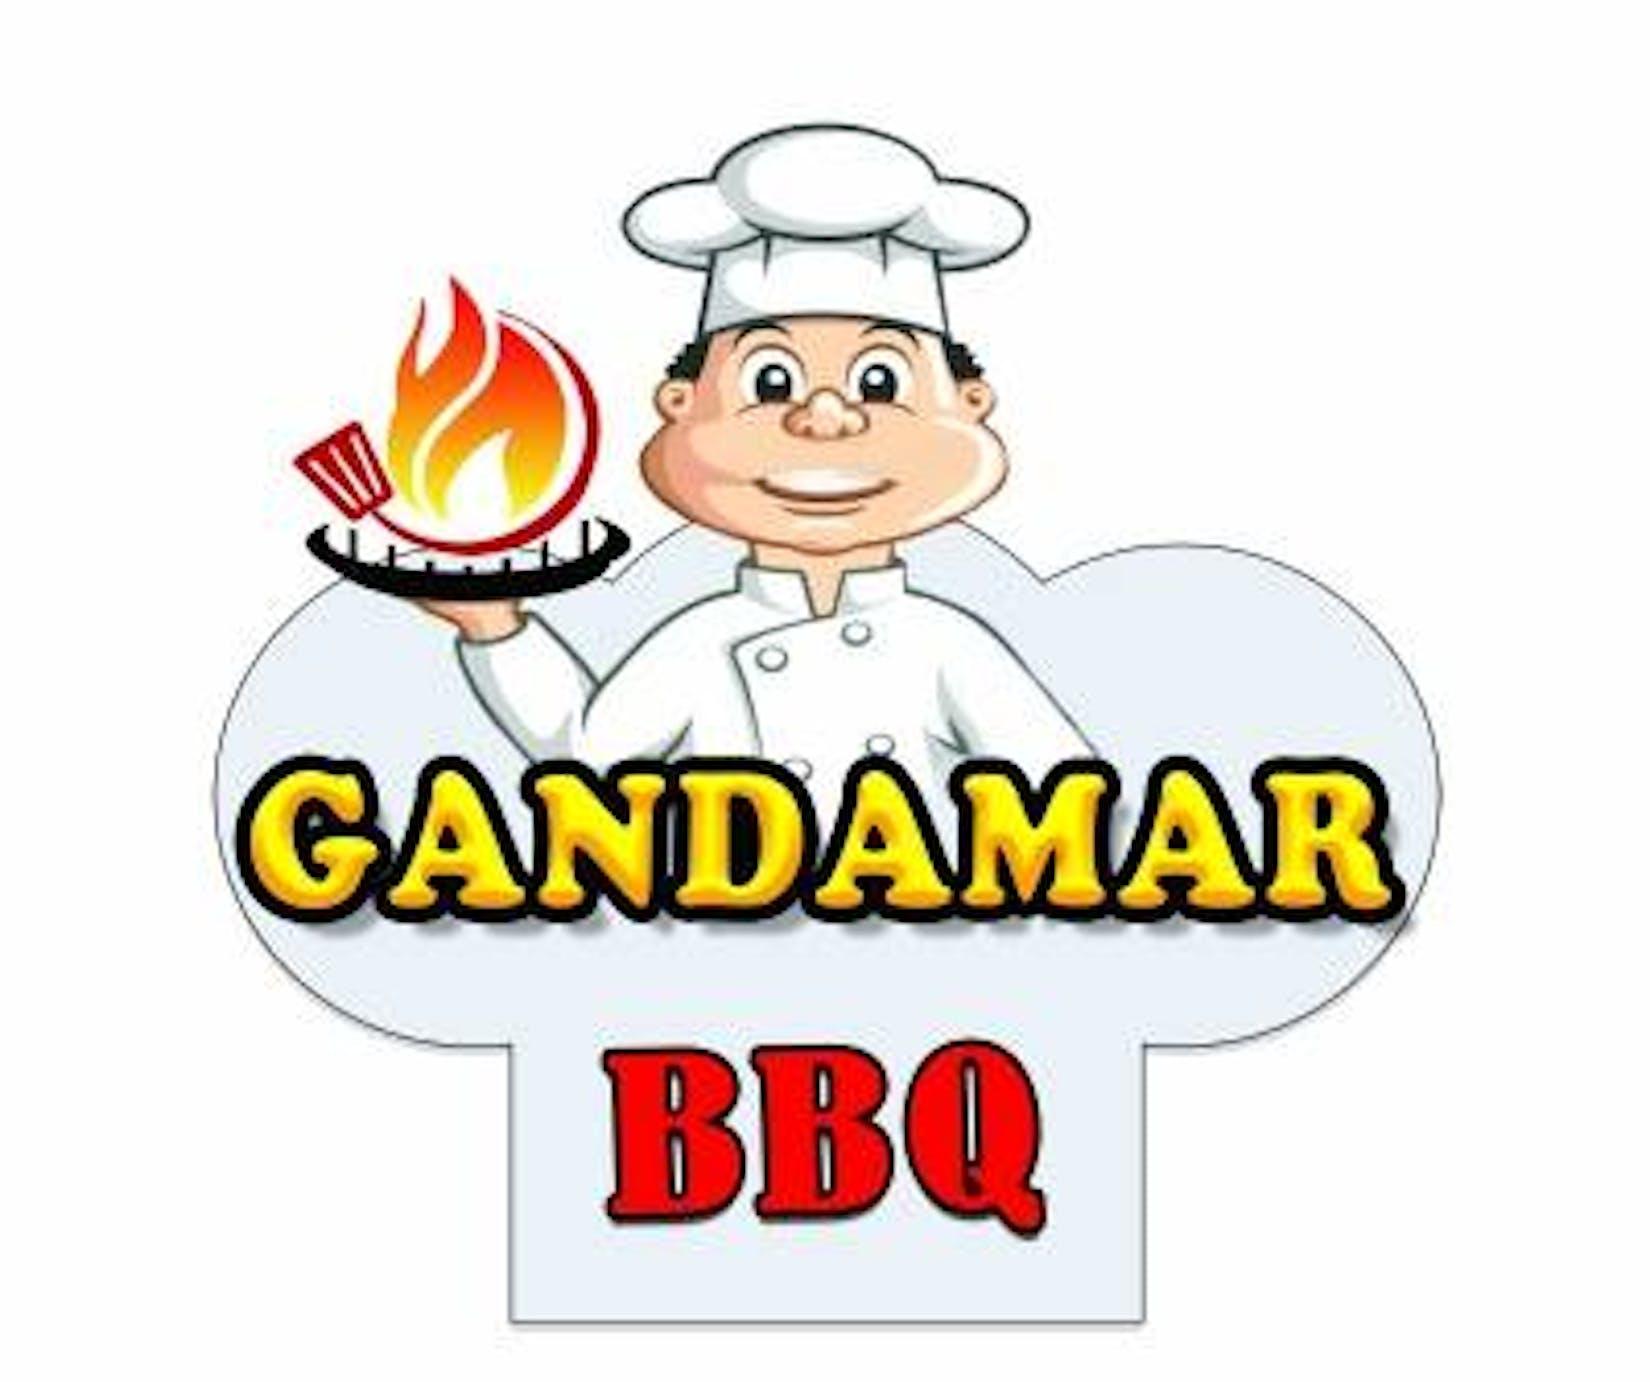 Gandamar BBQ | yathar